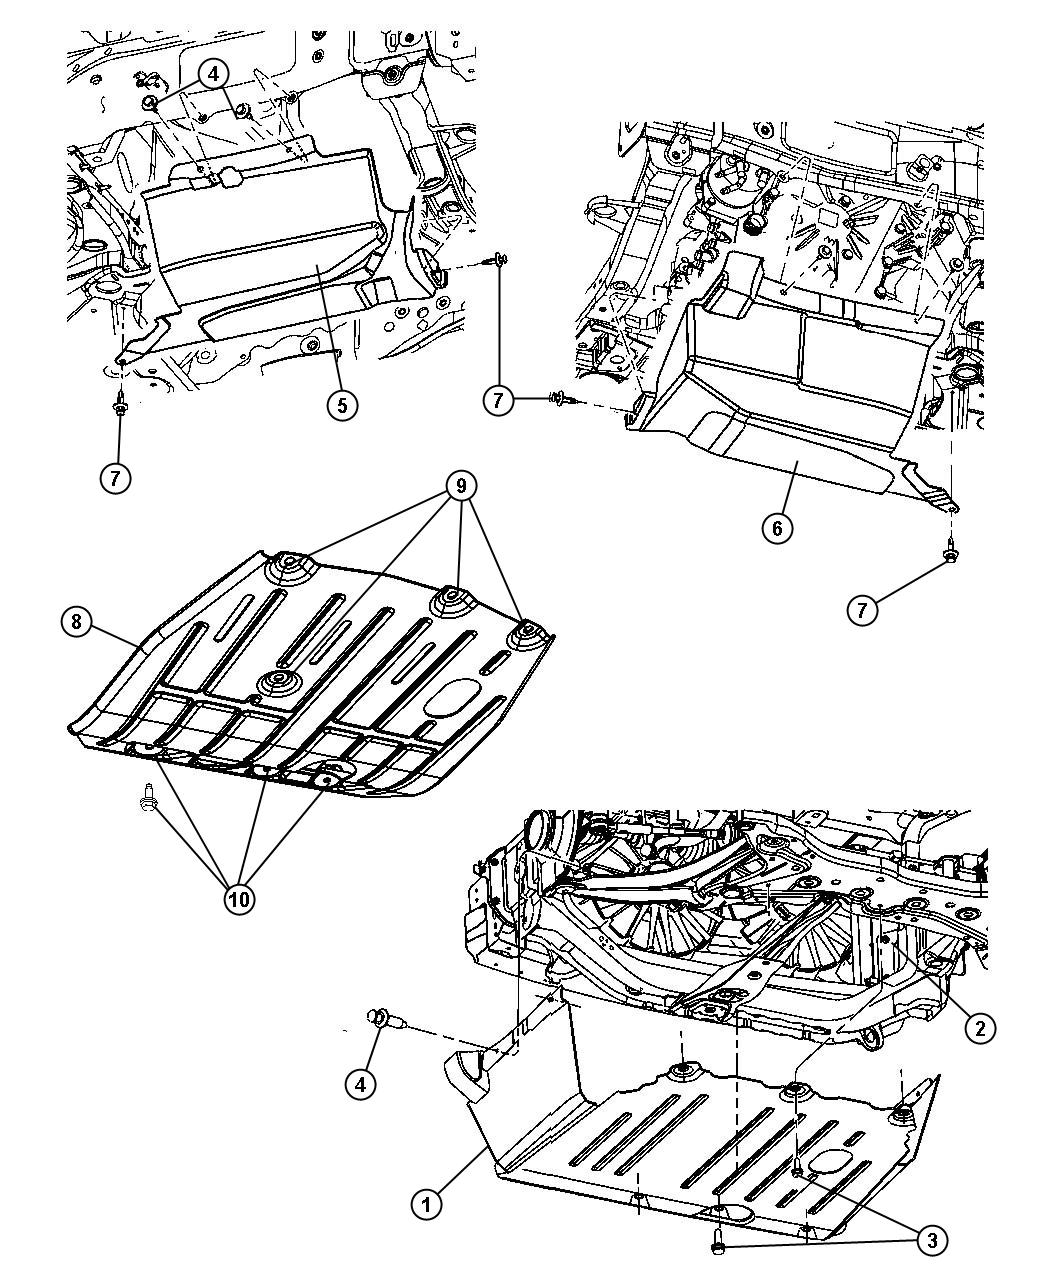 Jeep Patriot Belly pan. Front. [2.2l i4 single td om651